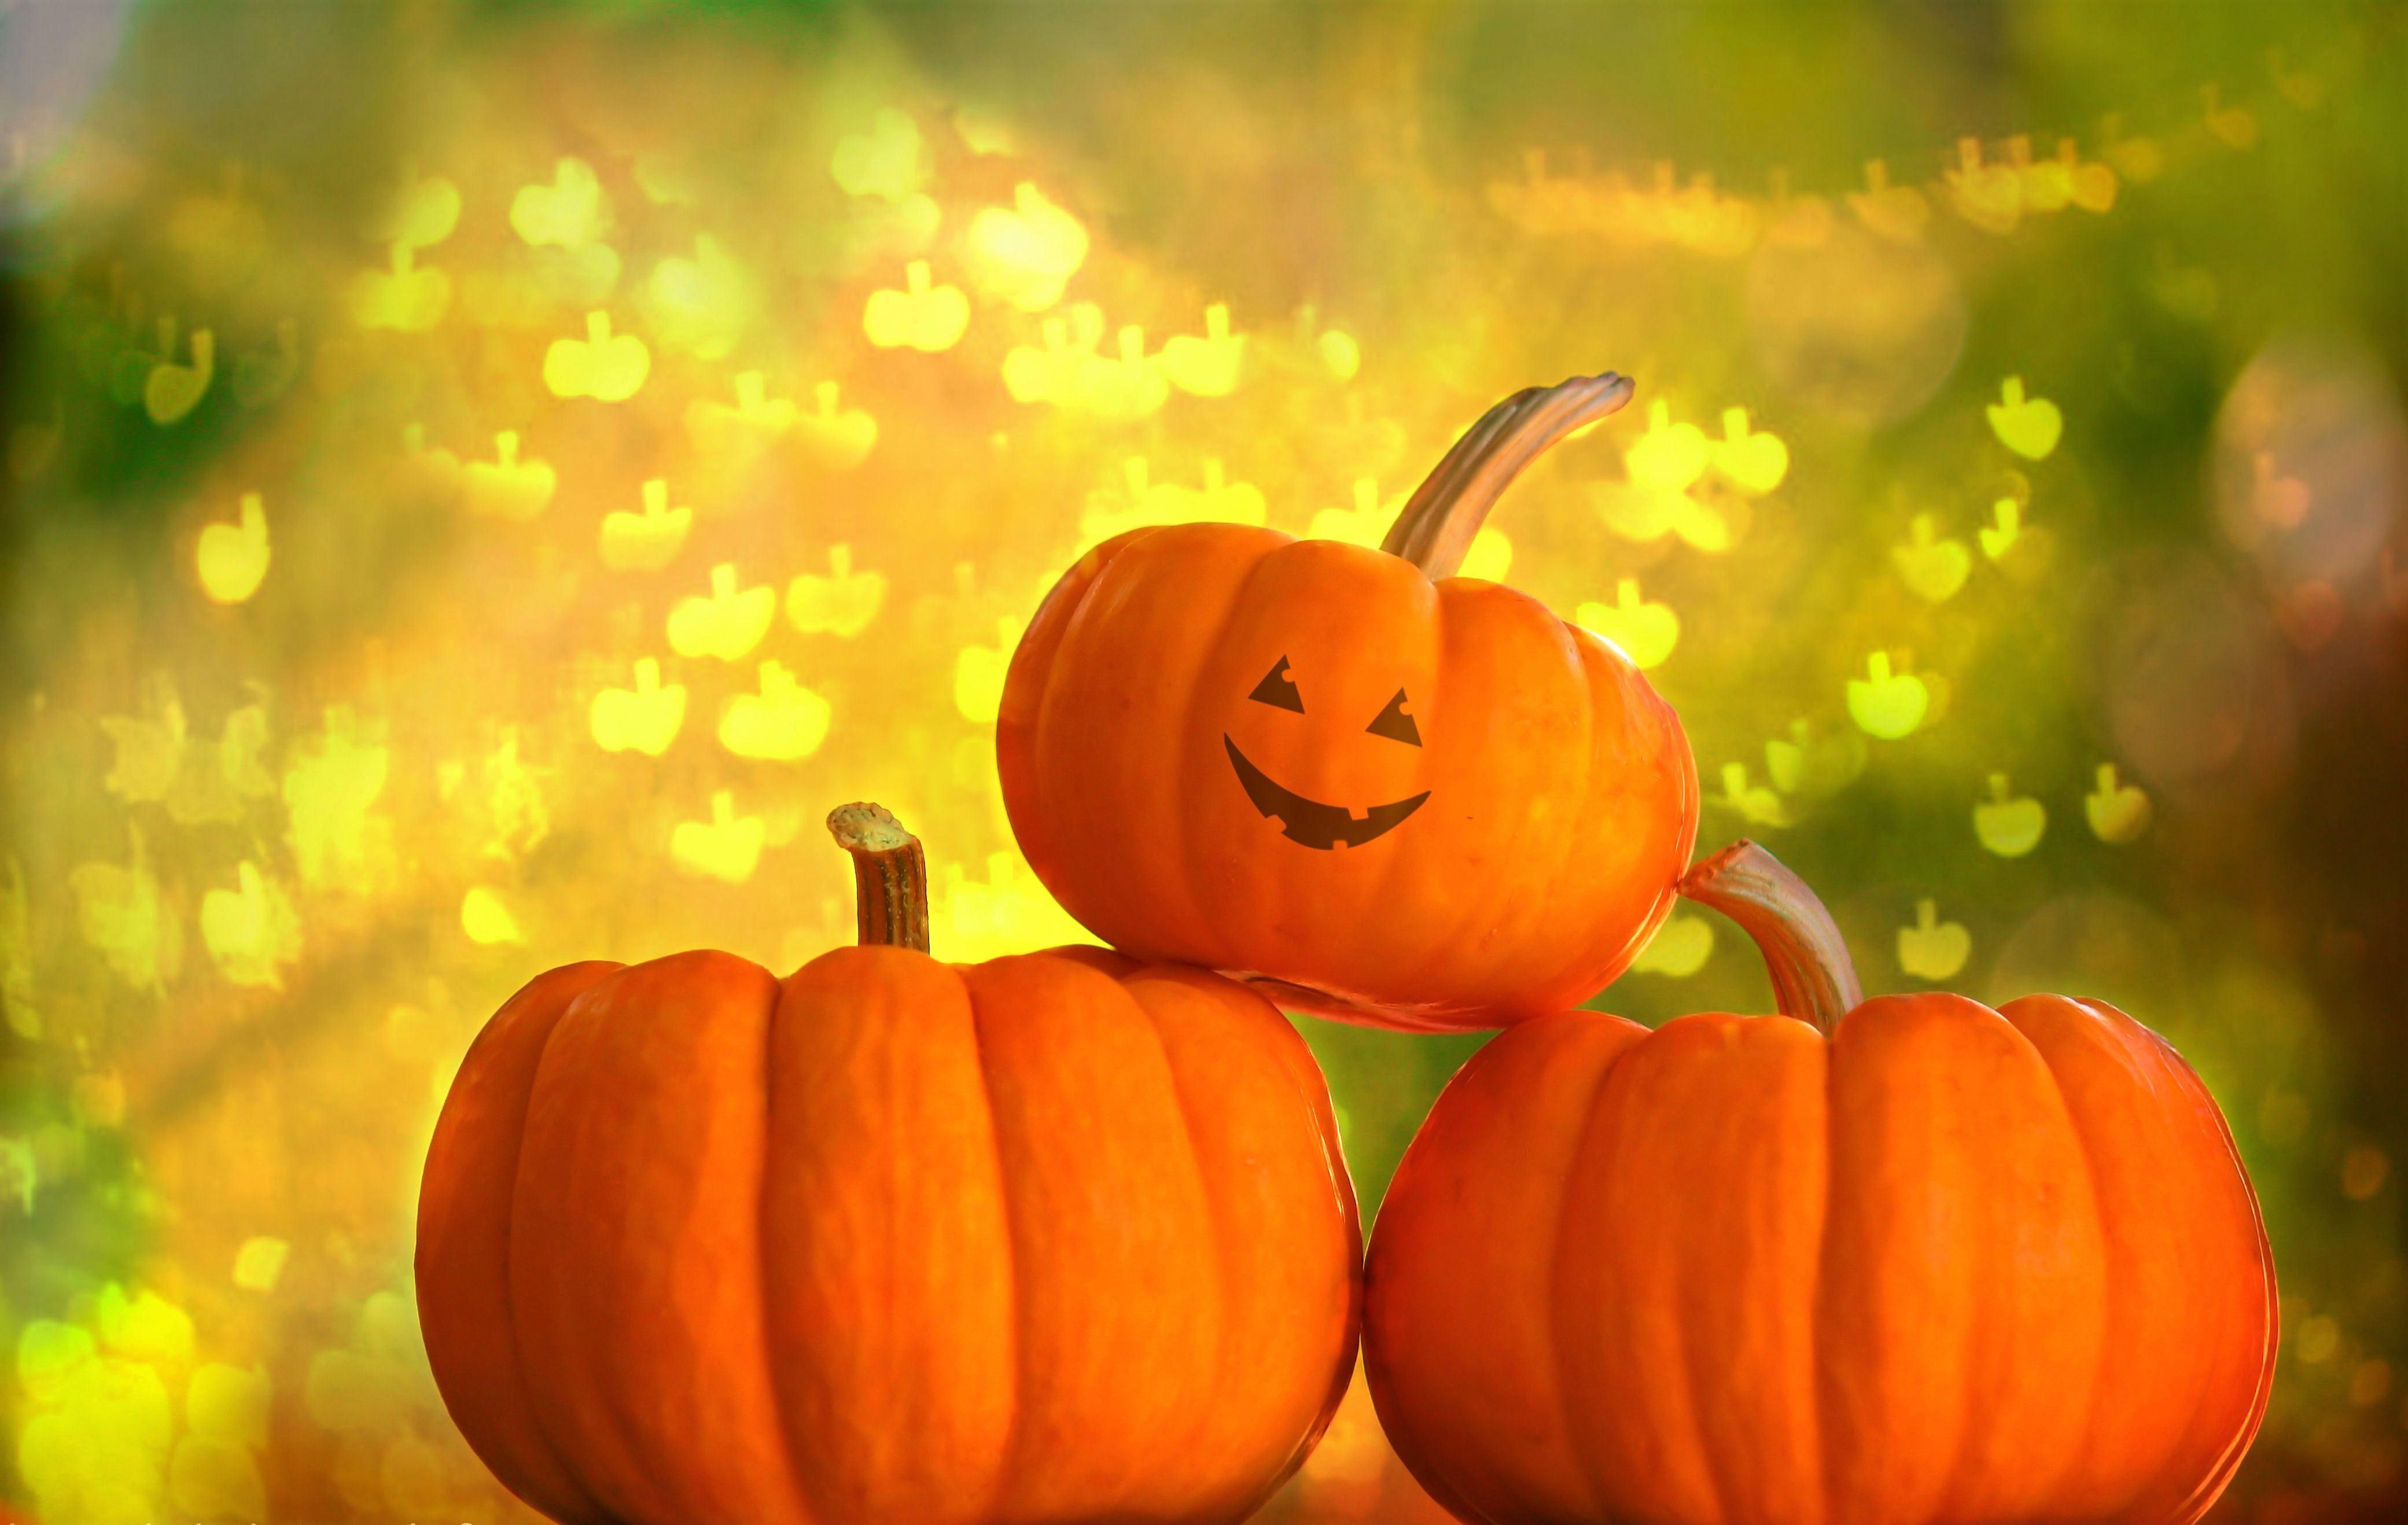 Halloween: Face, Smile, Holiday, Halloween, Pumpkin, Gourd